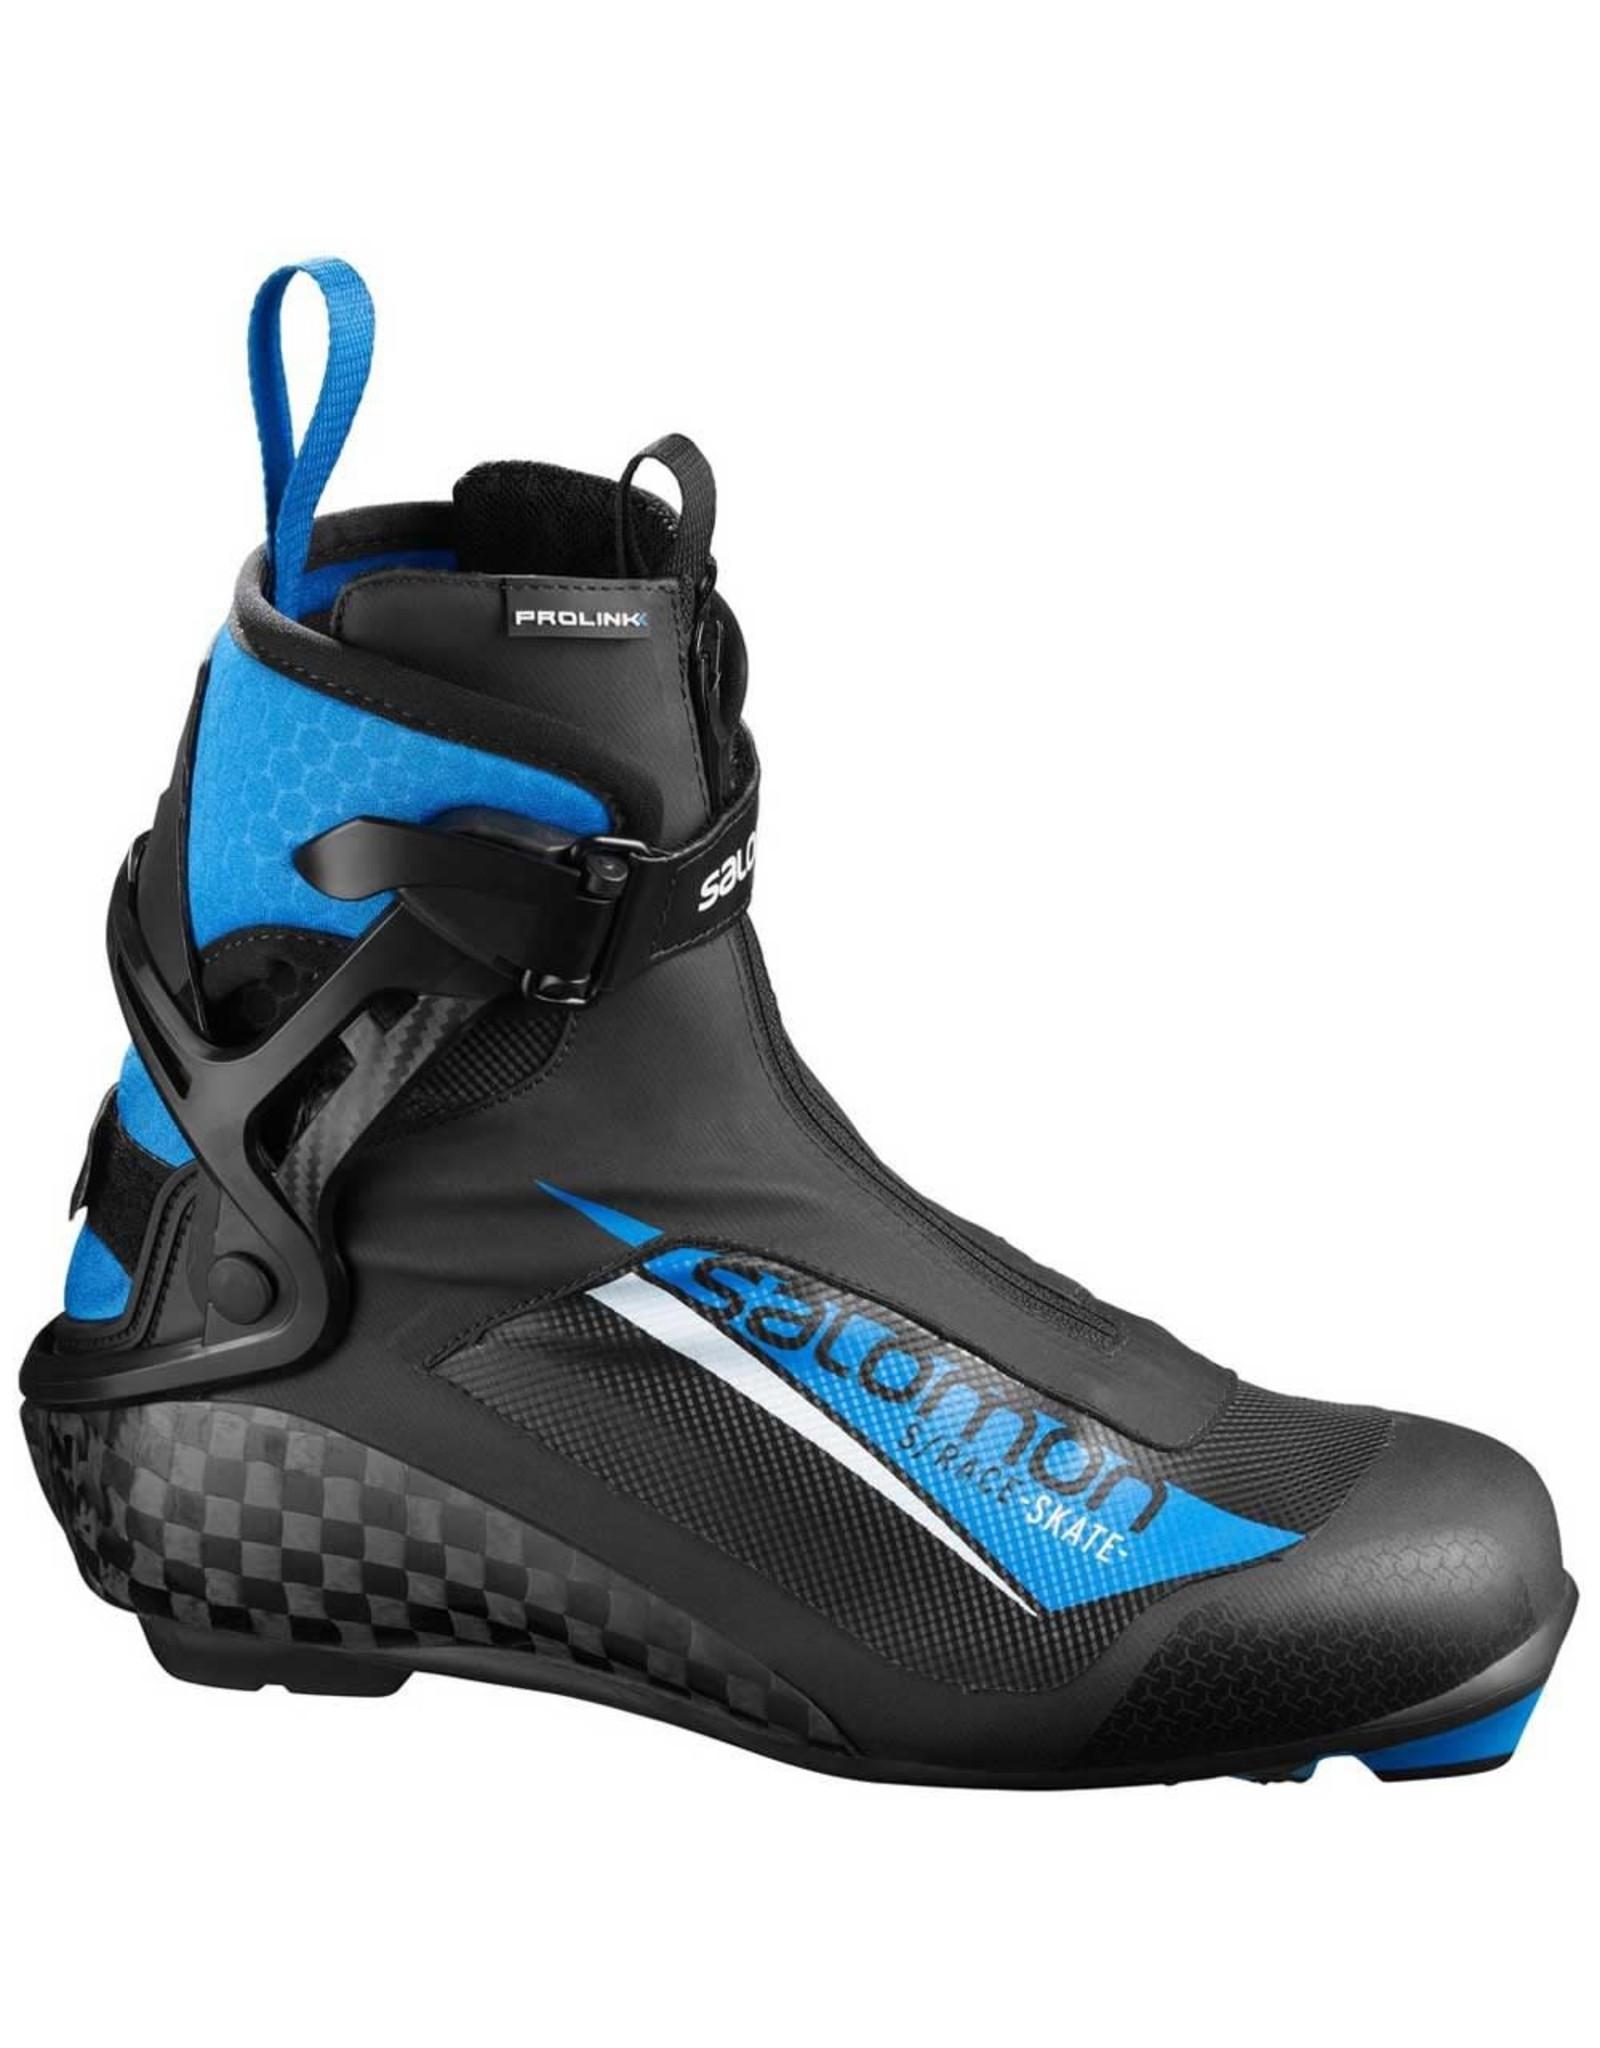 Salomon Salomon S/Race Skate Prolink Boots